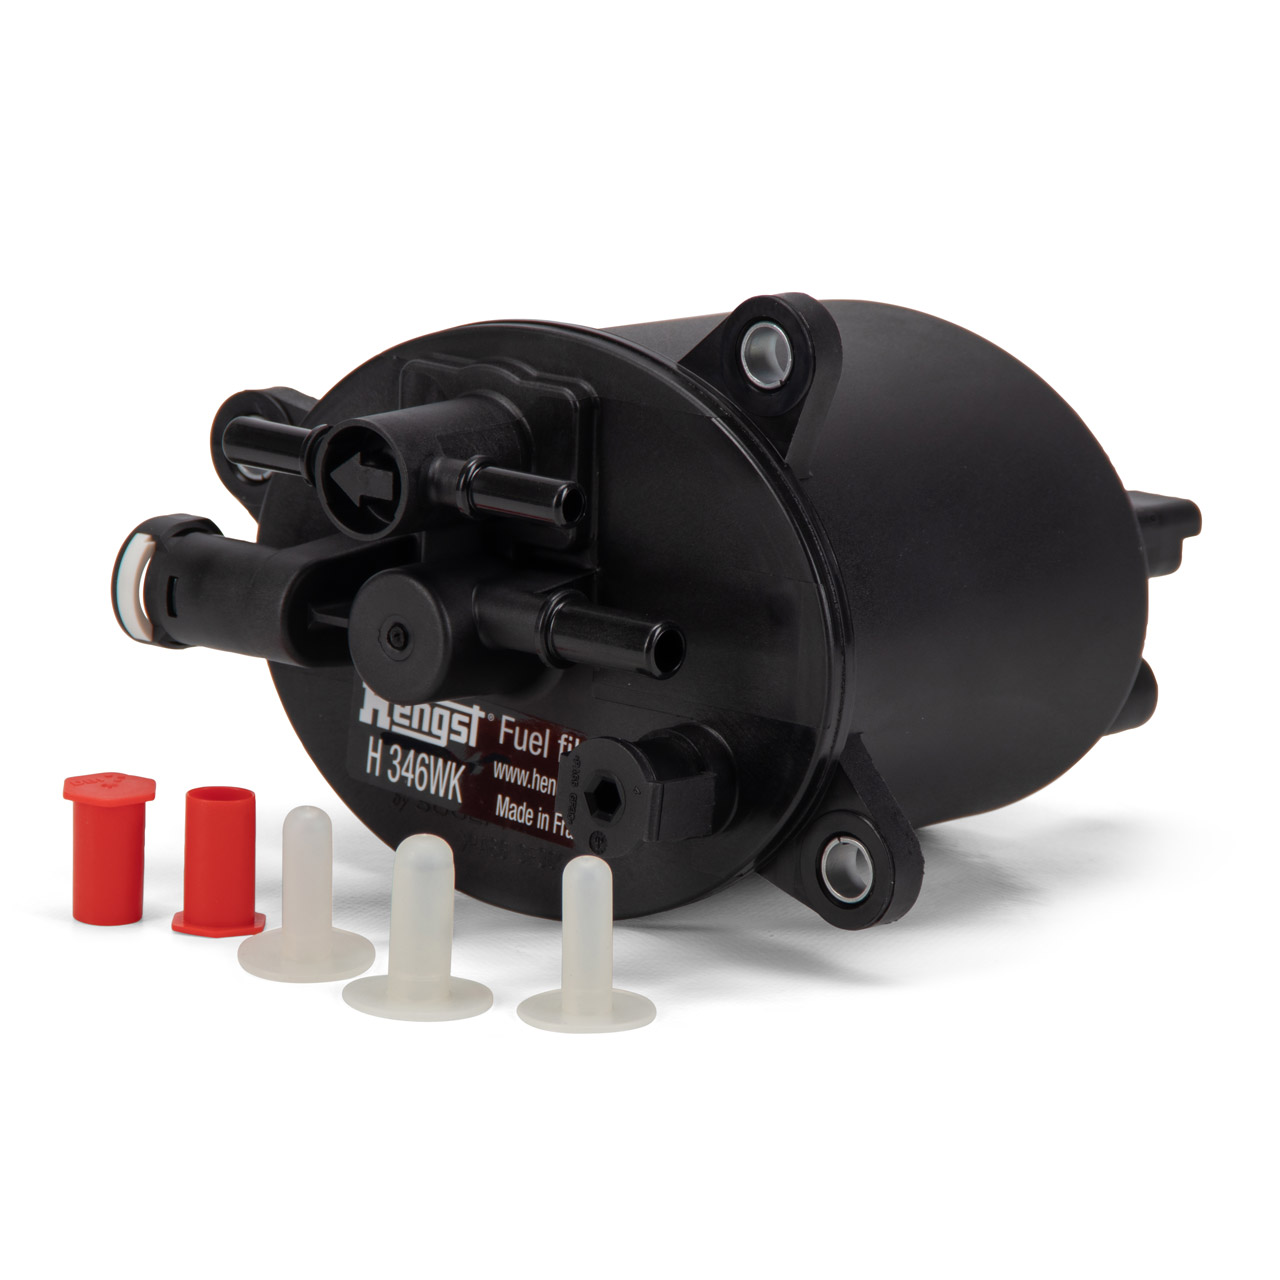 HENGST H346WK Kraftstofffilter CITROEN FIAT FORD LANCIA PEUGEOT 2.2 DIESEL